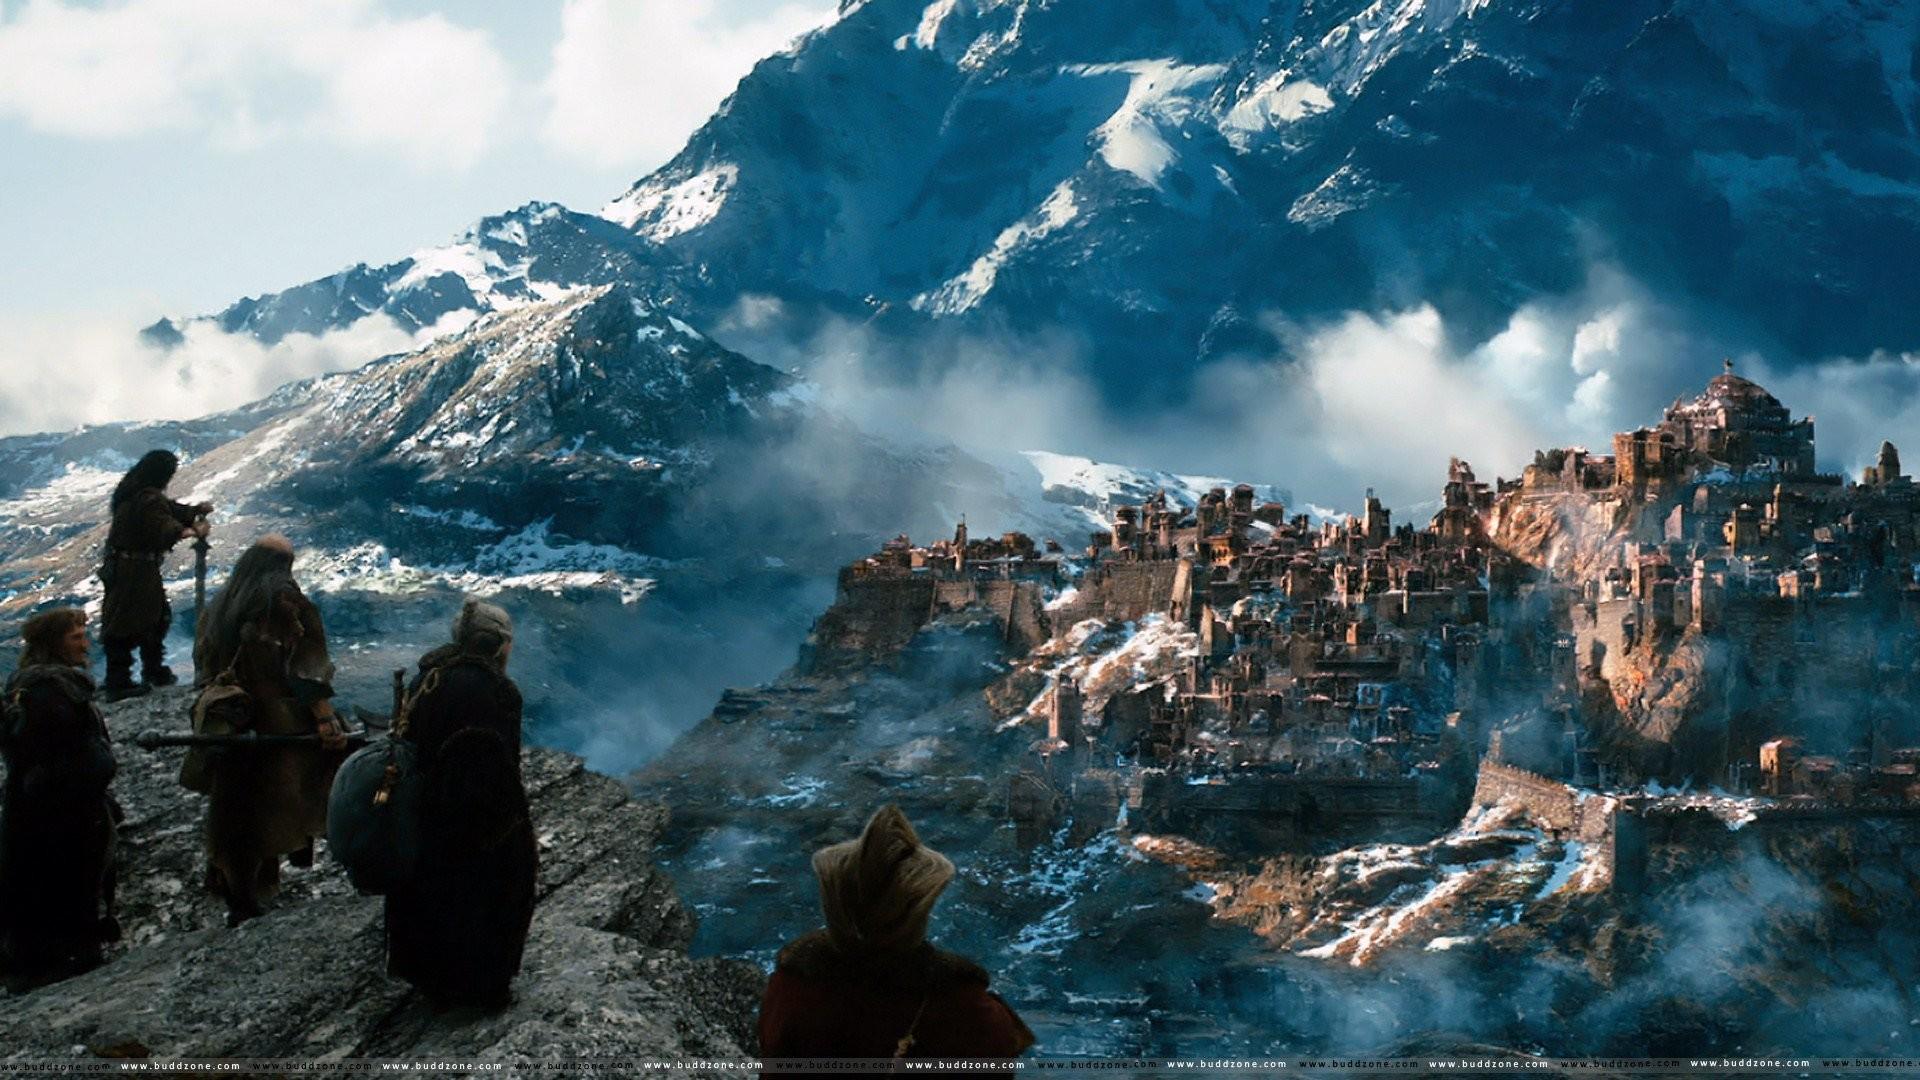 The Hobbit Desolation Of Smaug 2013 fantasy city castle